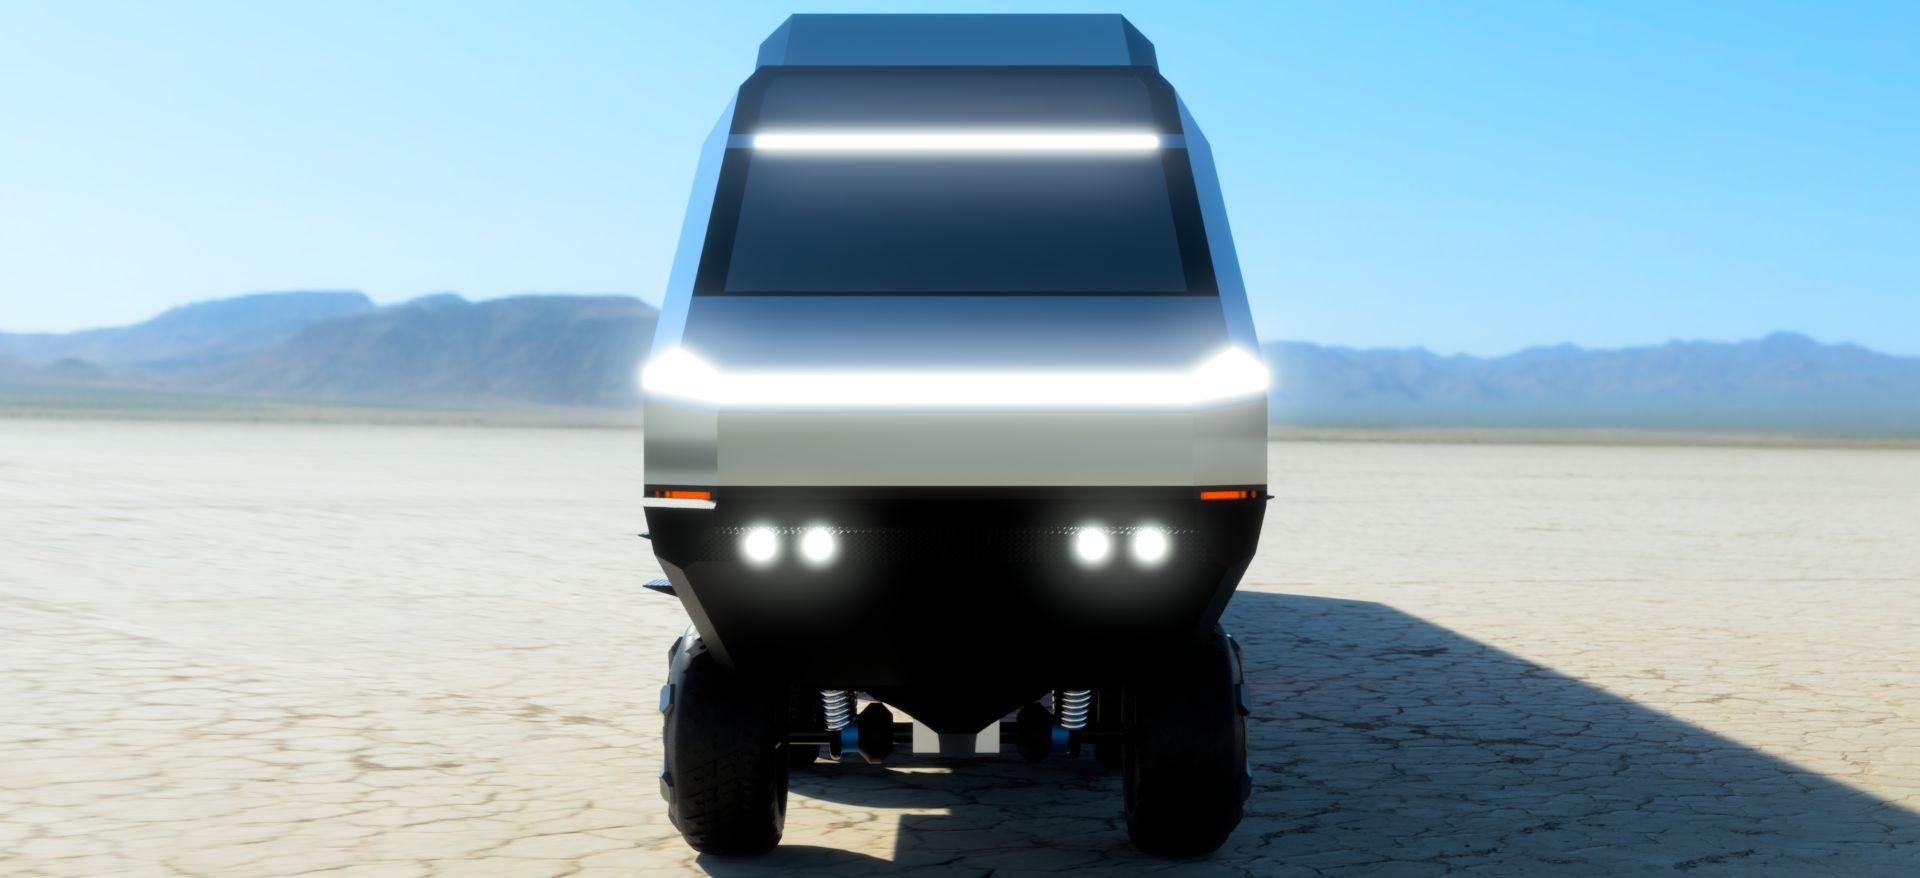 Tesla-cybervan-2020-apr-14-03-31-50am-000-customizedview23450588794-png-3500-3500